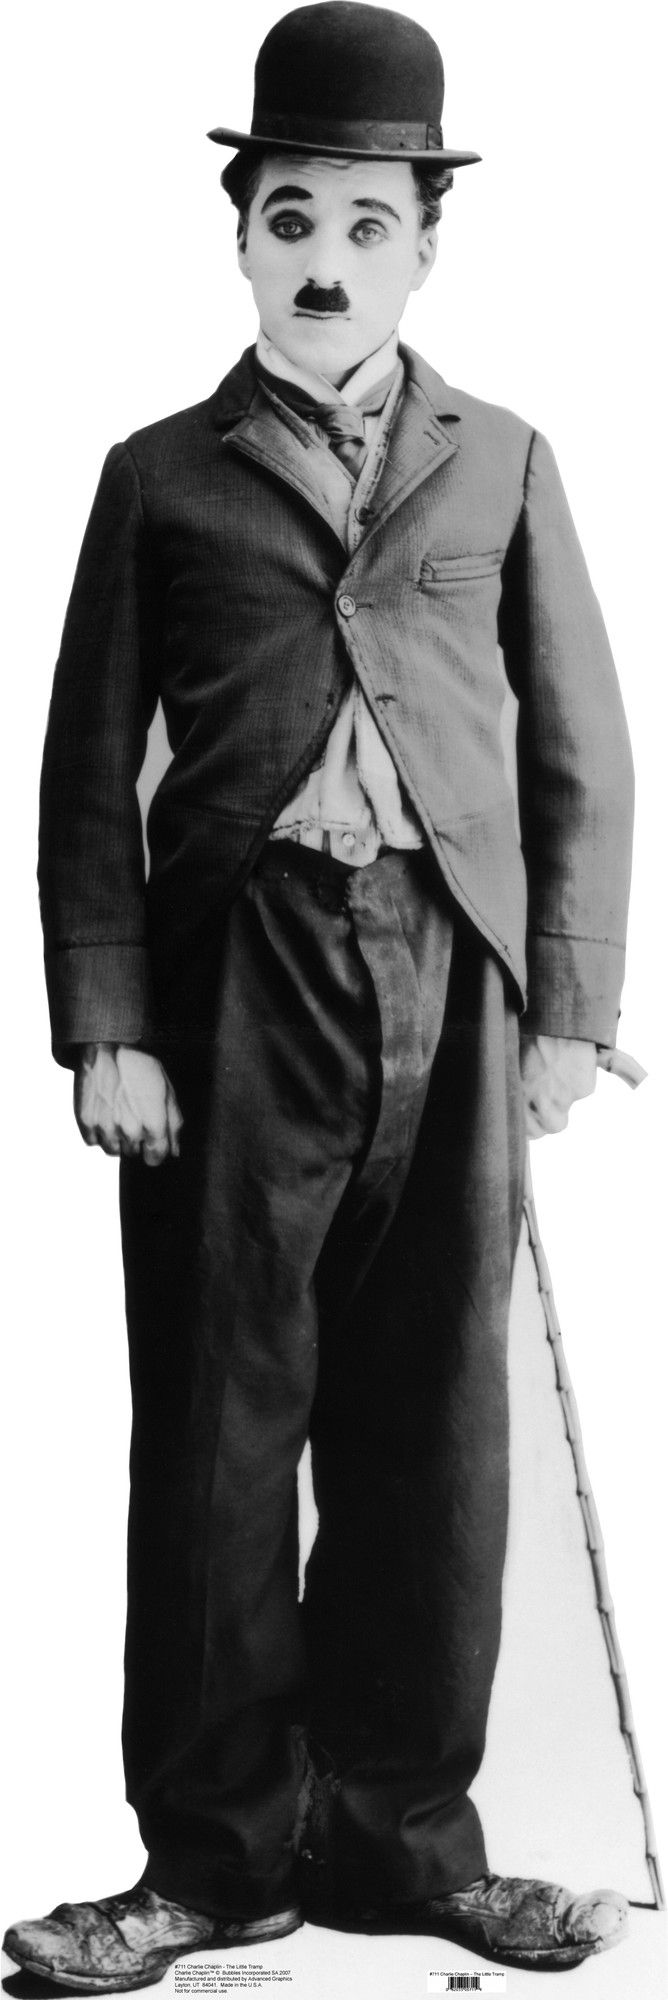 Hollywood Charlie Chaplin Cardboard Stand-Up